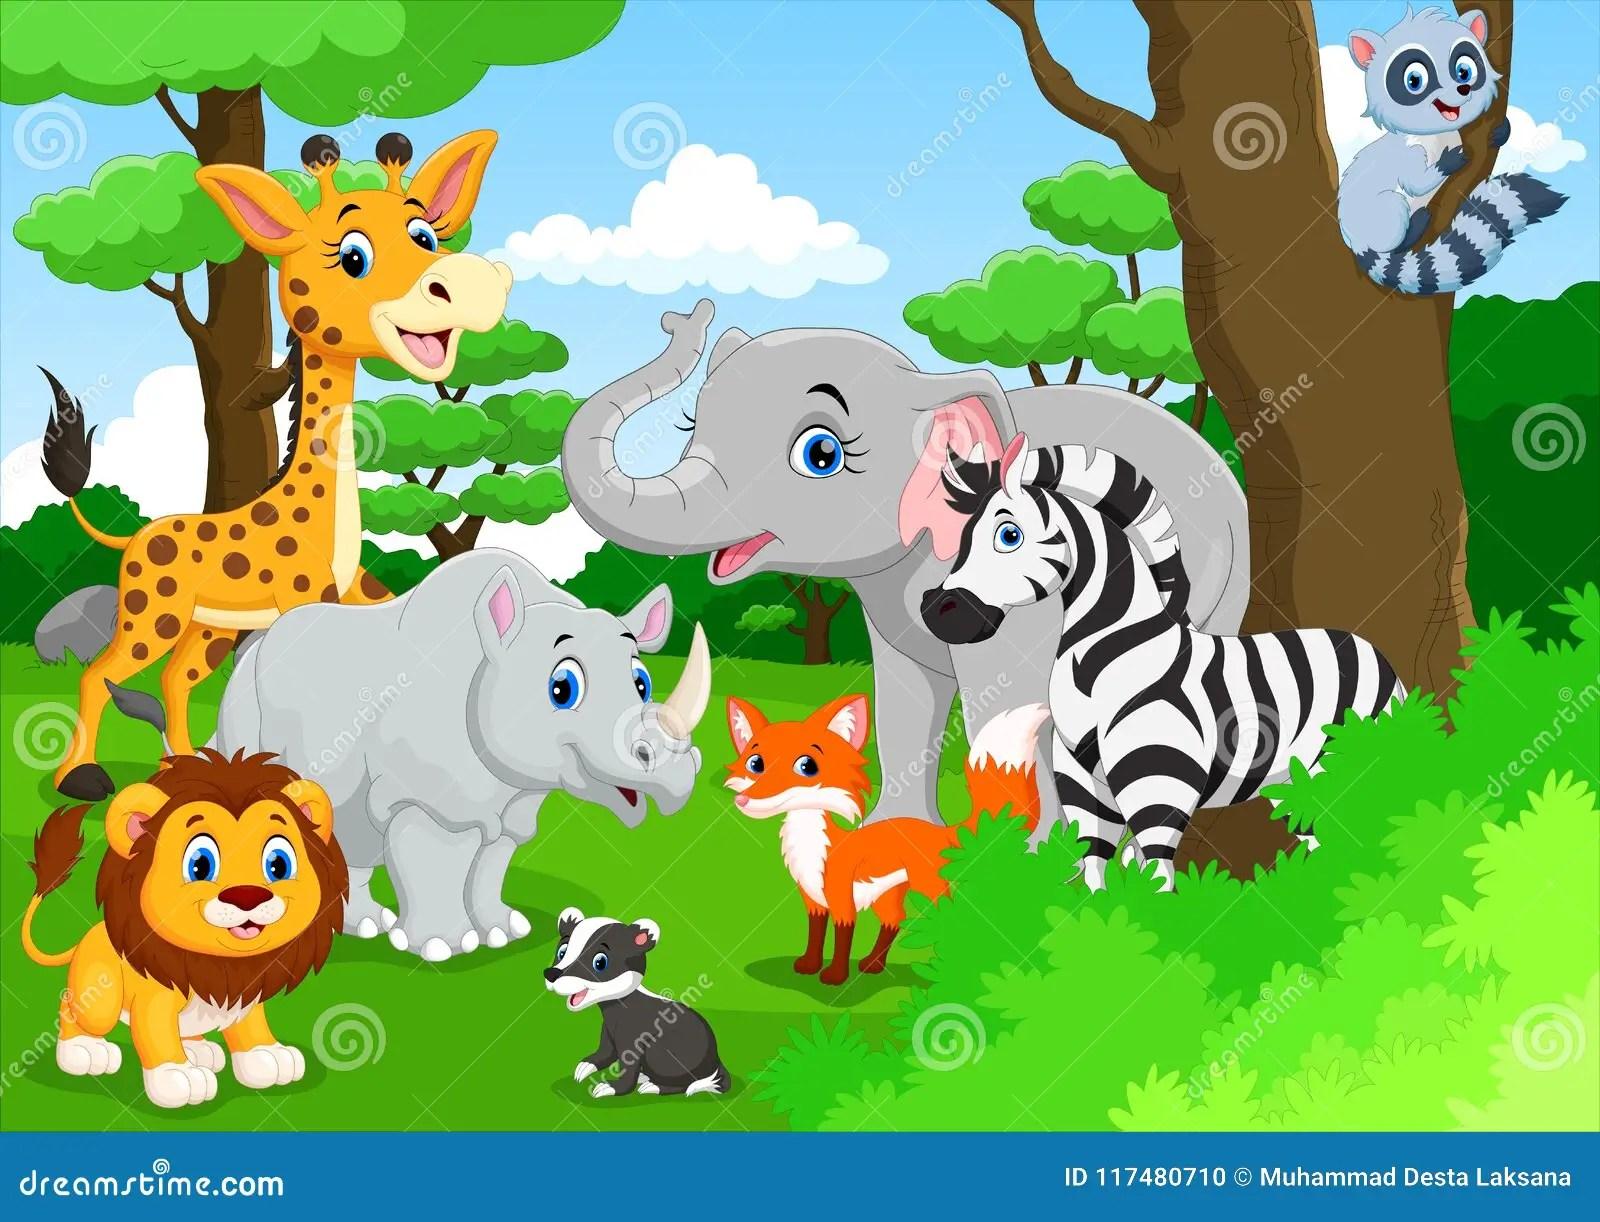 Desenhos Animados Bonitos Dos Animais Na Selva Ilustracao